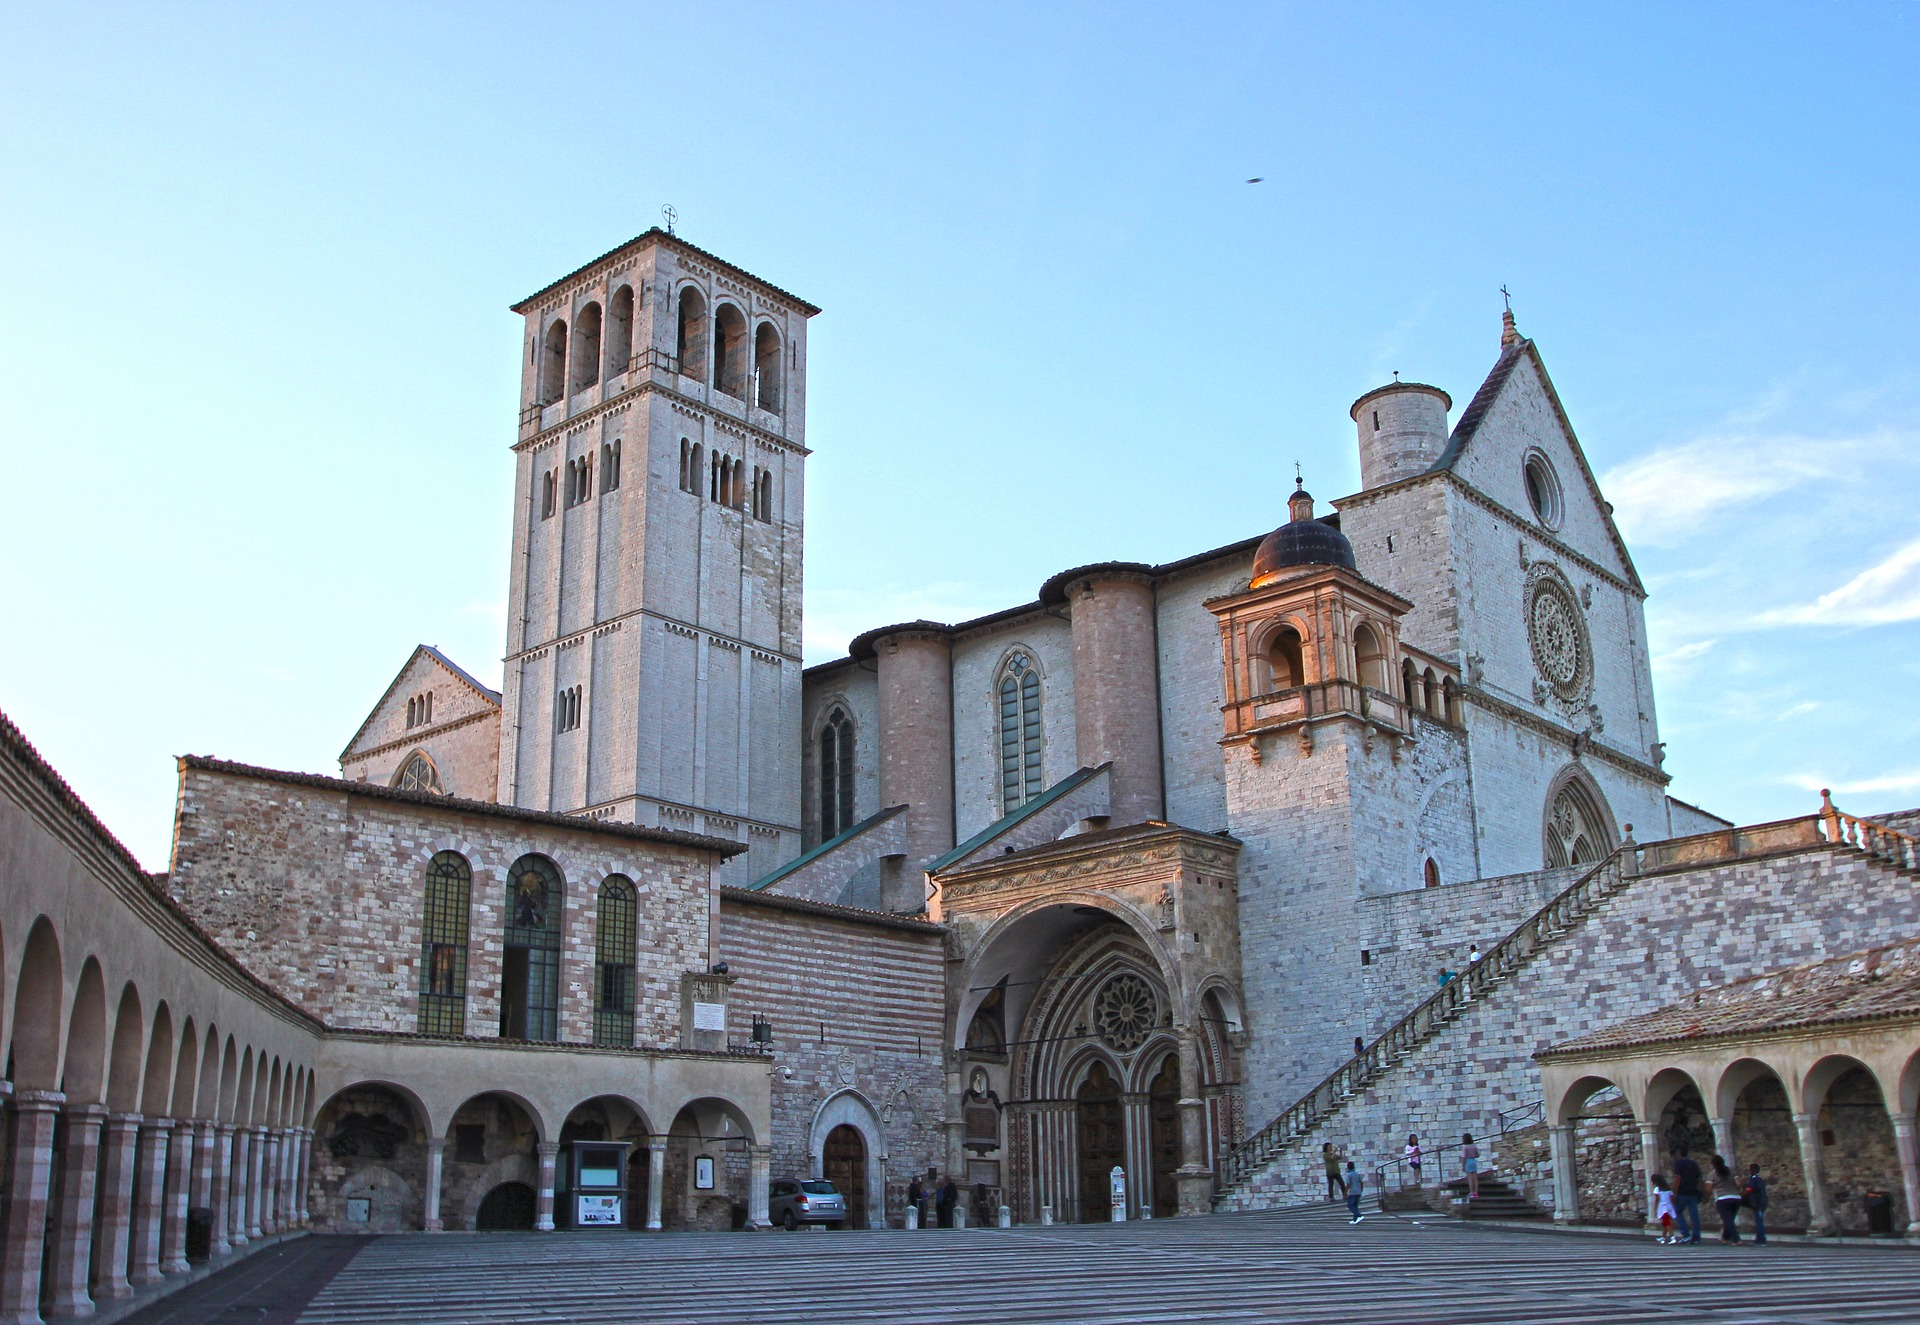 Mercatini di Natale in Umbria 2019Mercatini di Natale in Umbria 2019